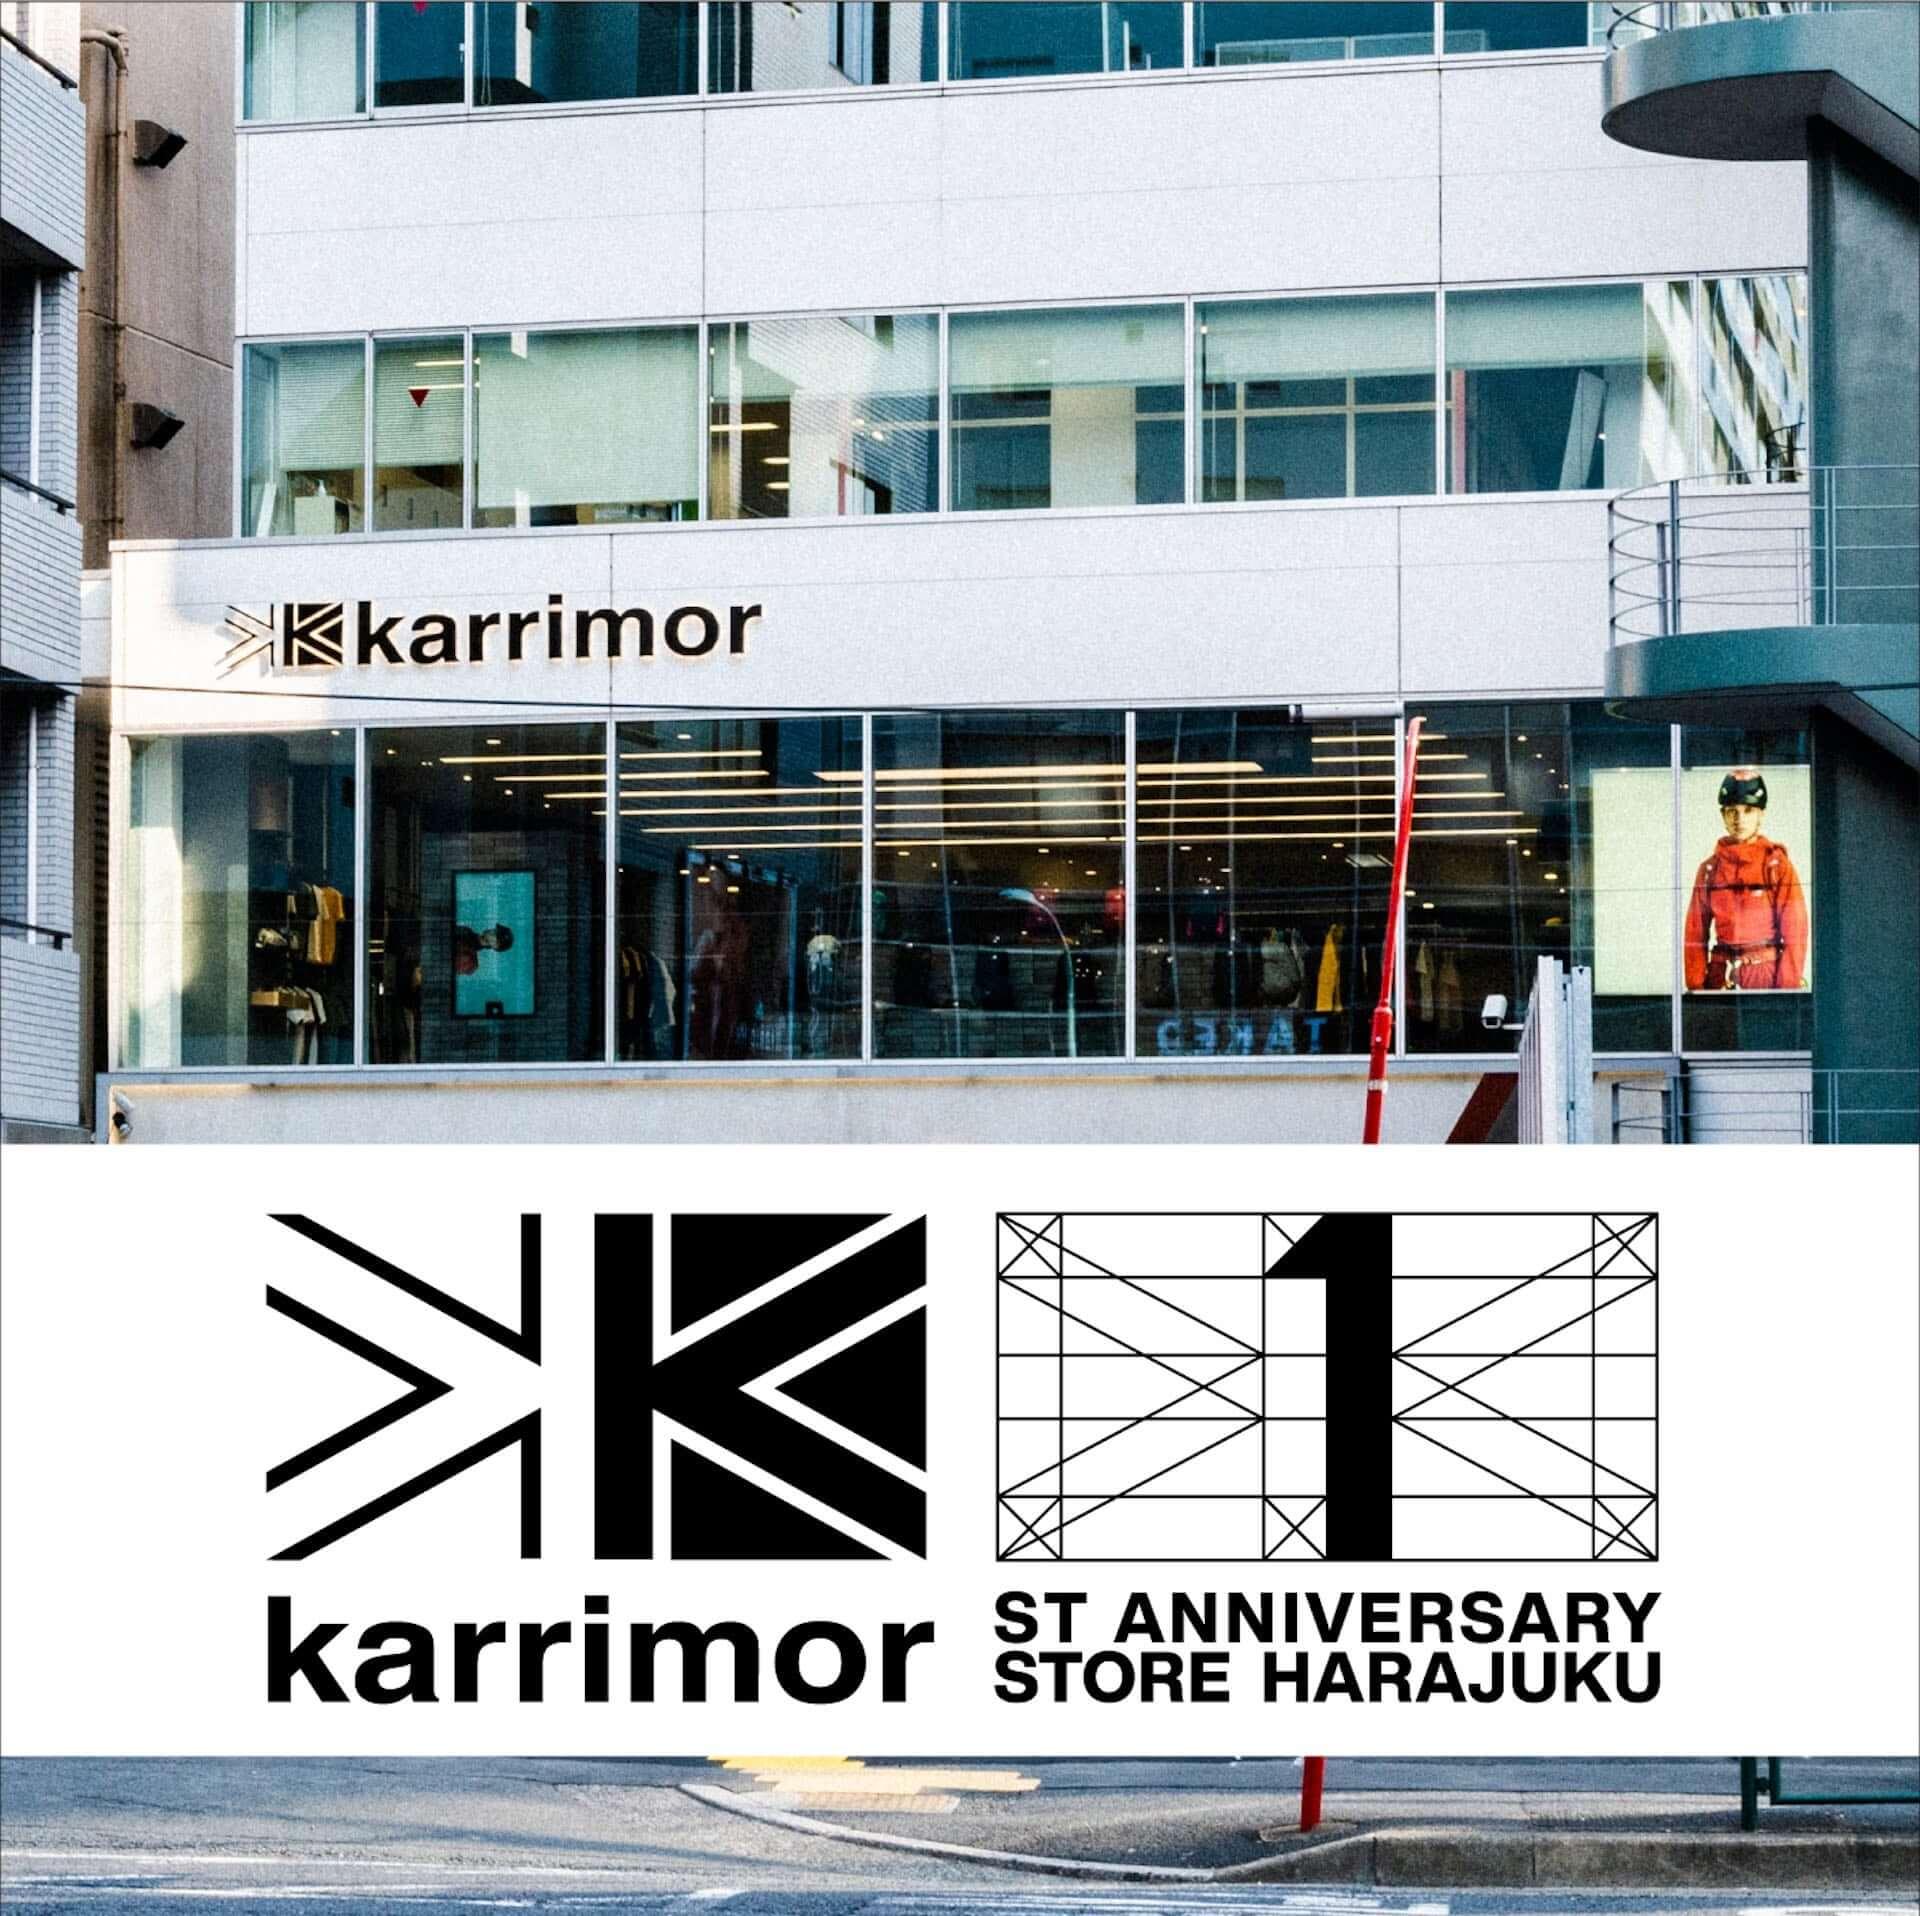 karrimorオリジナルのマルチカード型ツールをゲットしよう!2021年春夏シーズナルキャンペーン「Play in Adventure」が開催決定 lf210330_karrimor_10-1920x1916